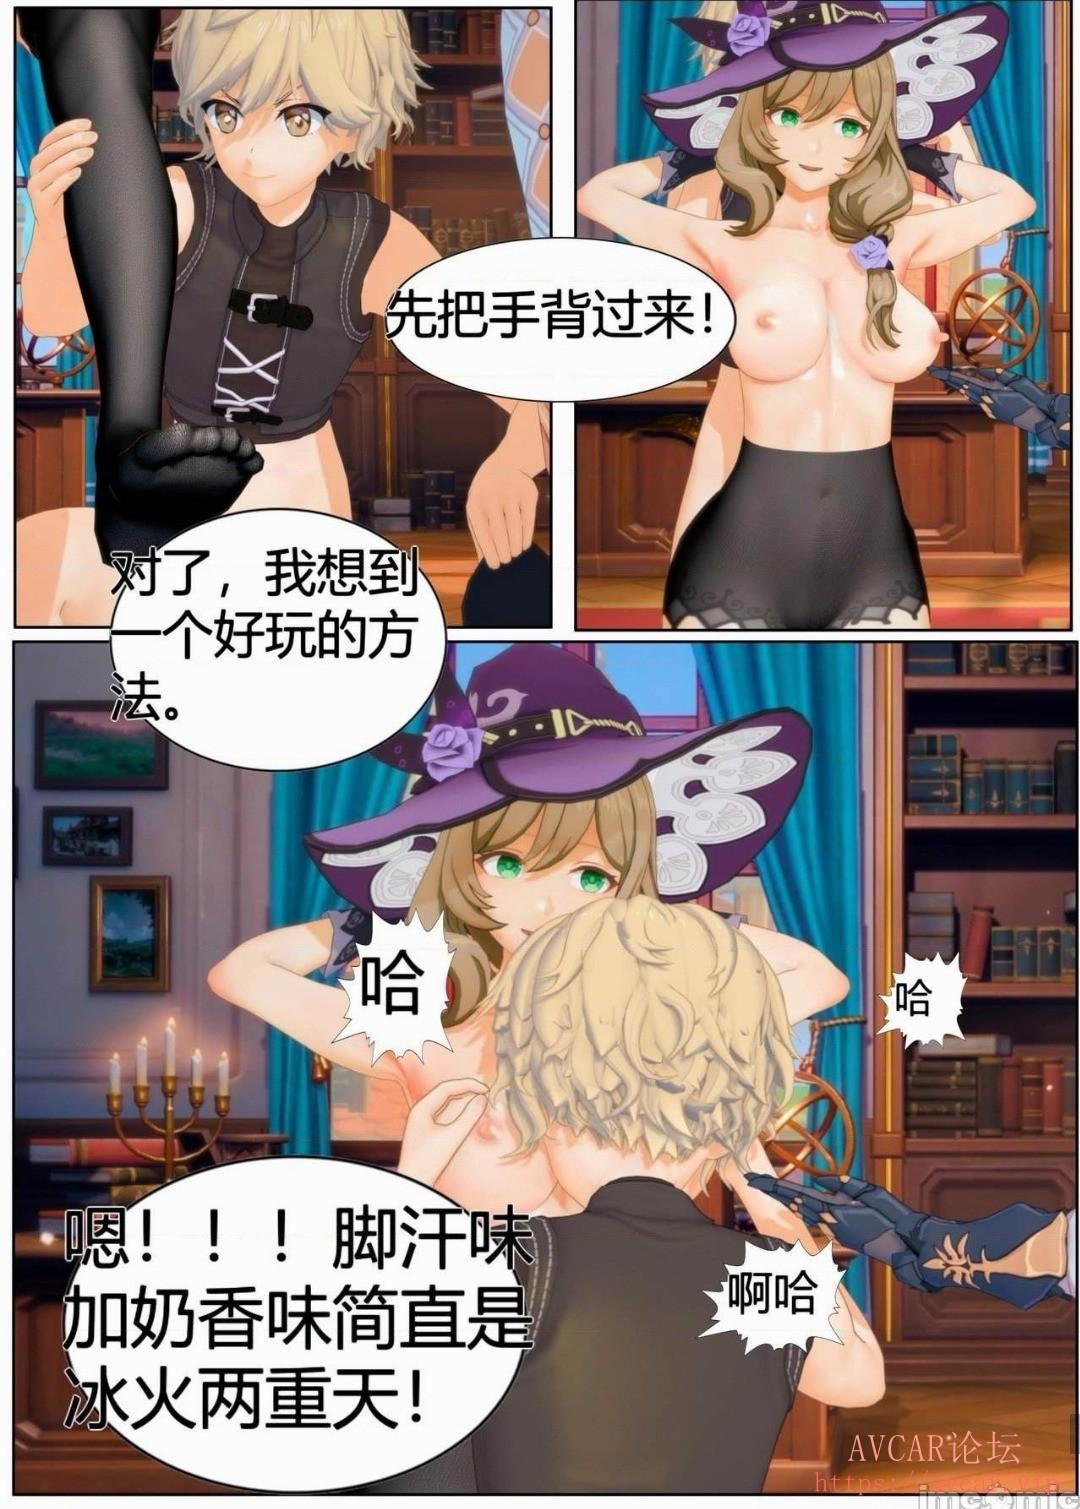 Screenshot_20210914_035732_com.new_comic18_edit_9376640727735.jpg